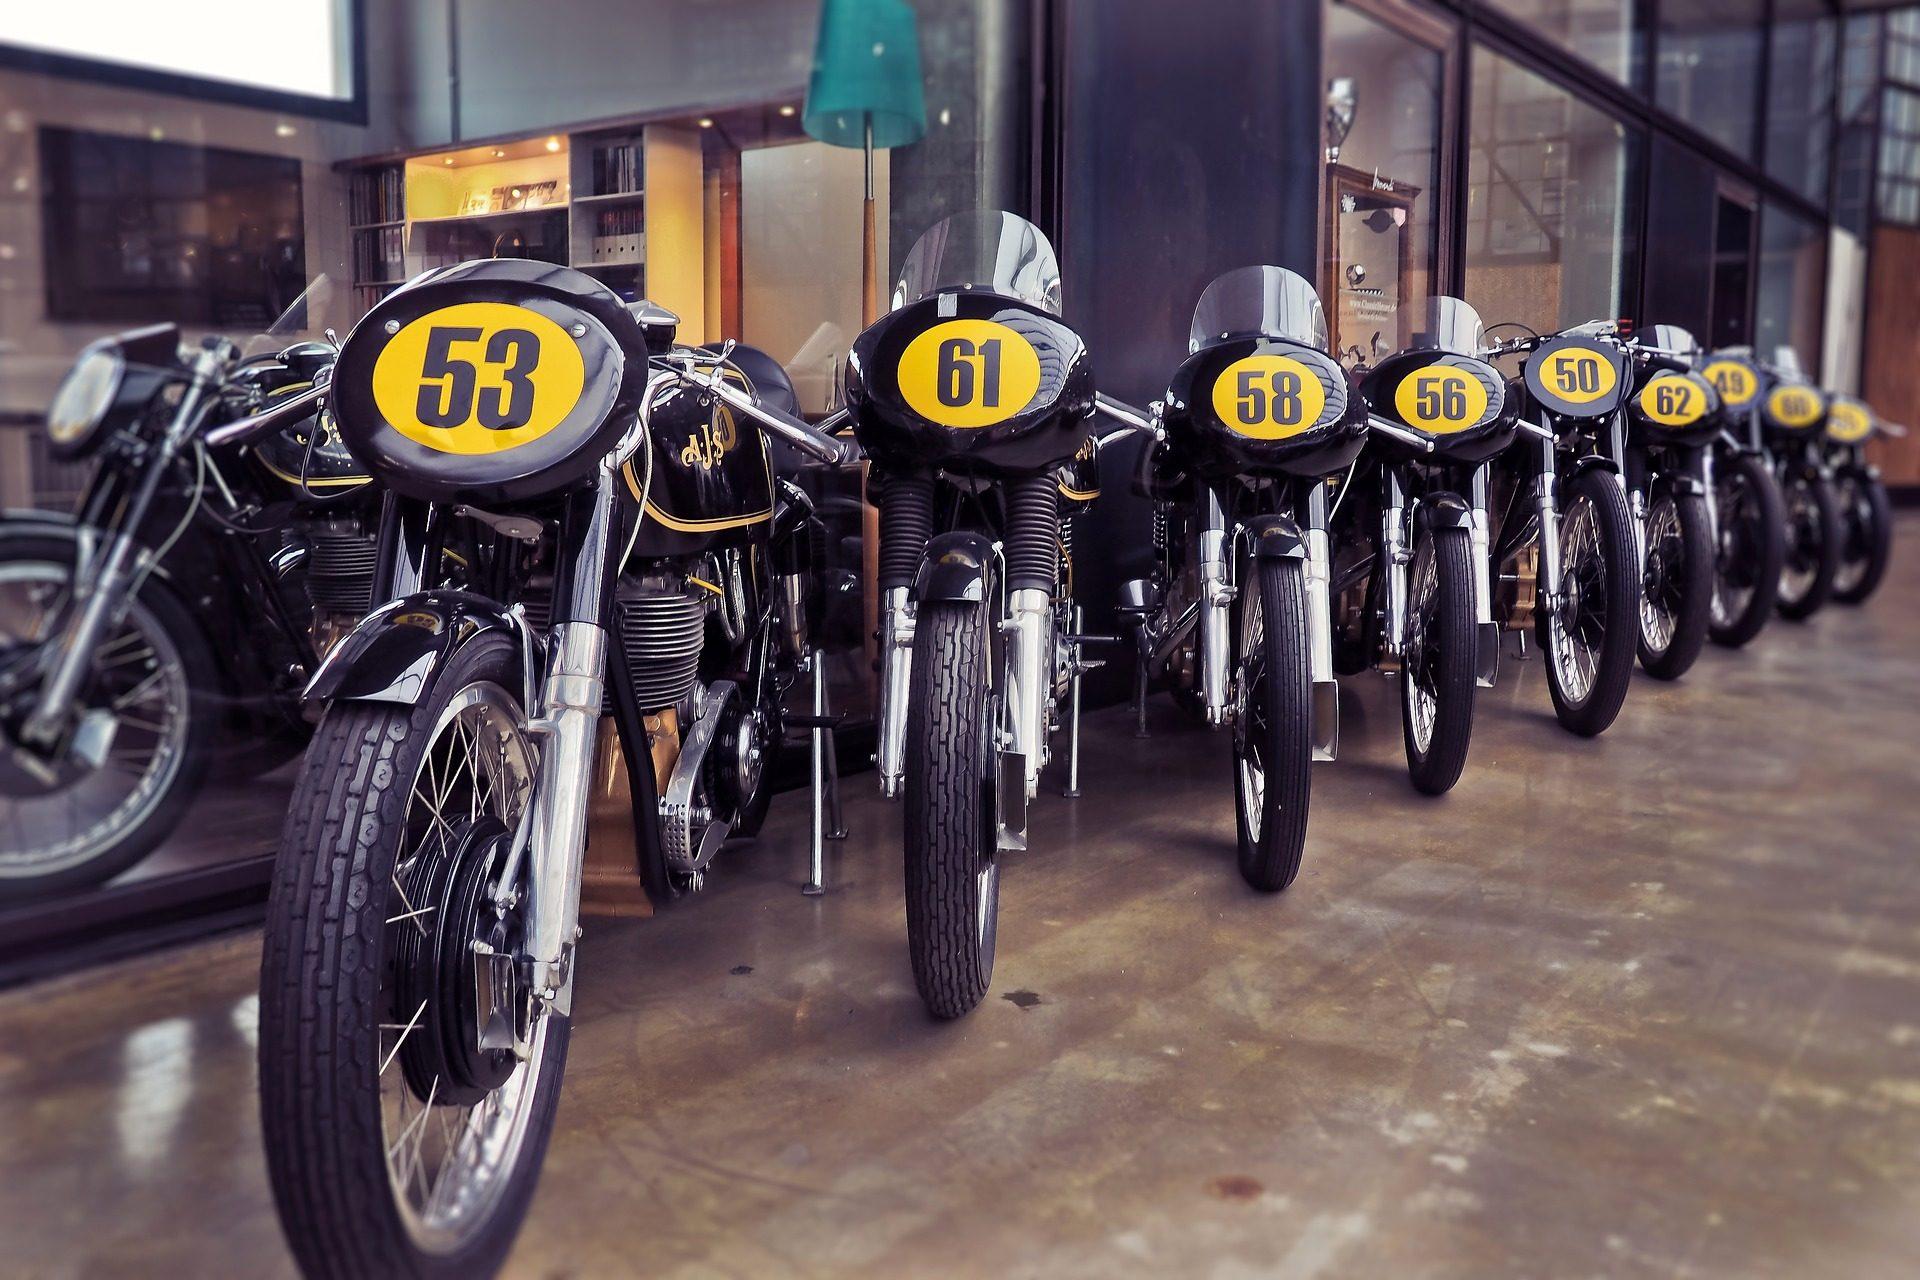 motocicletas, オートバイ, クラシック, 古代, ヴィンテージ - HD の壁紙 - 教授-falken.com